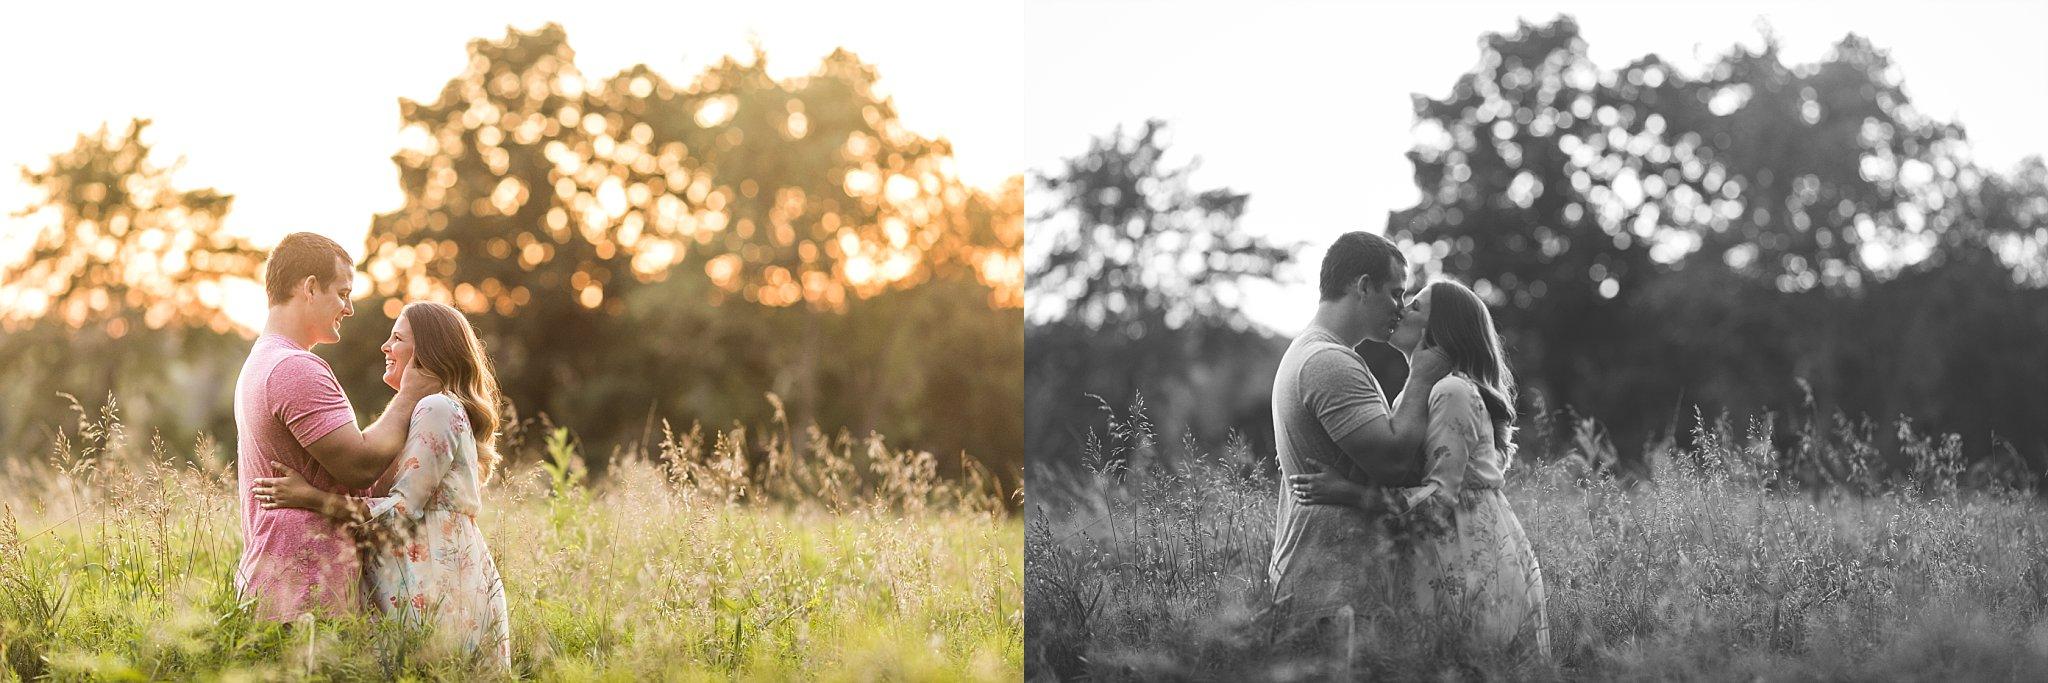 Allentown Couples Photographer